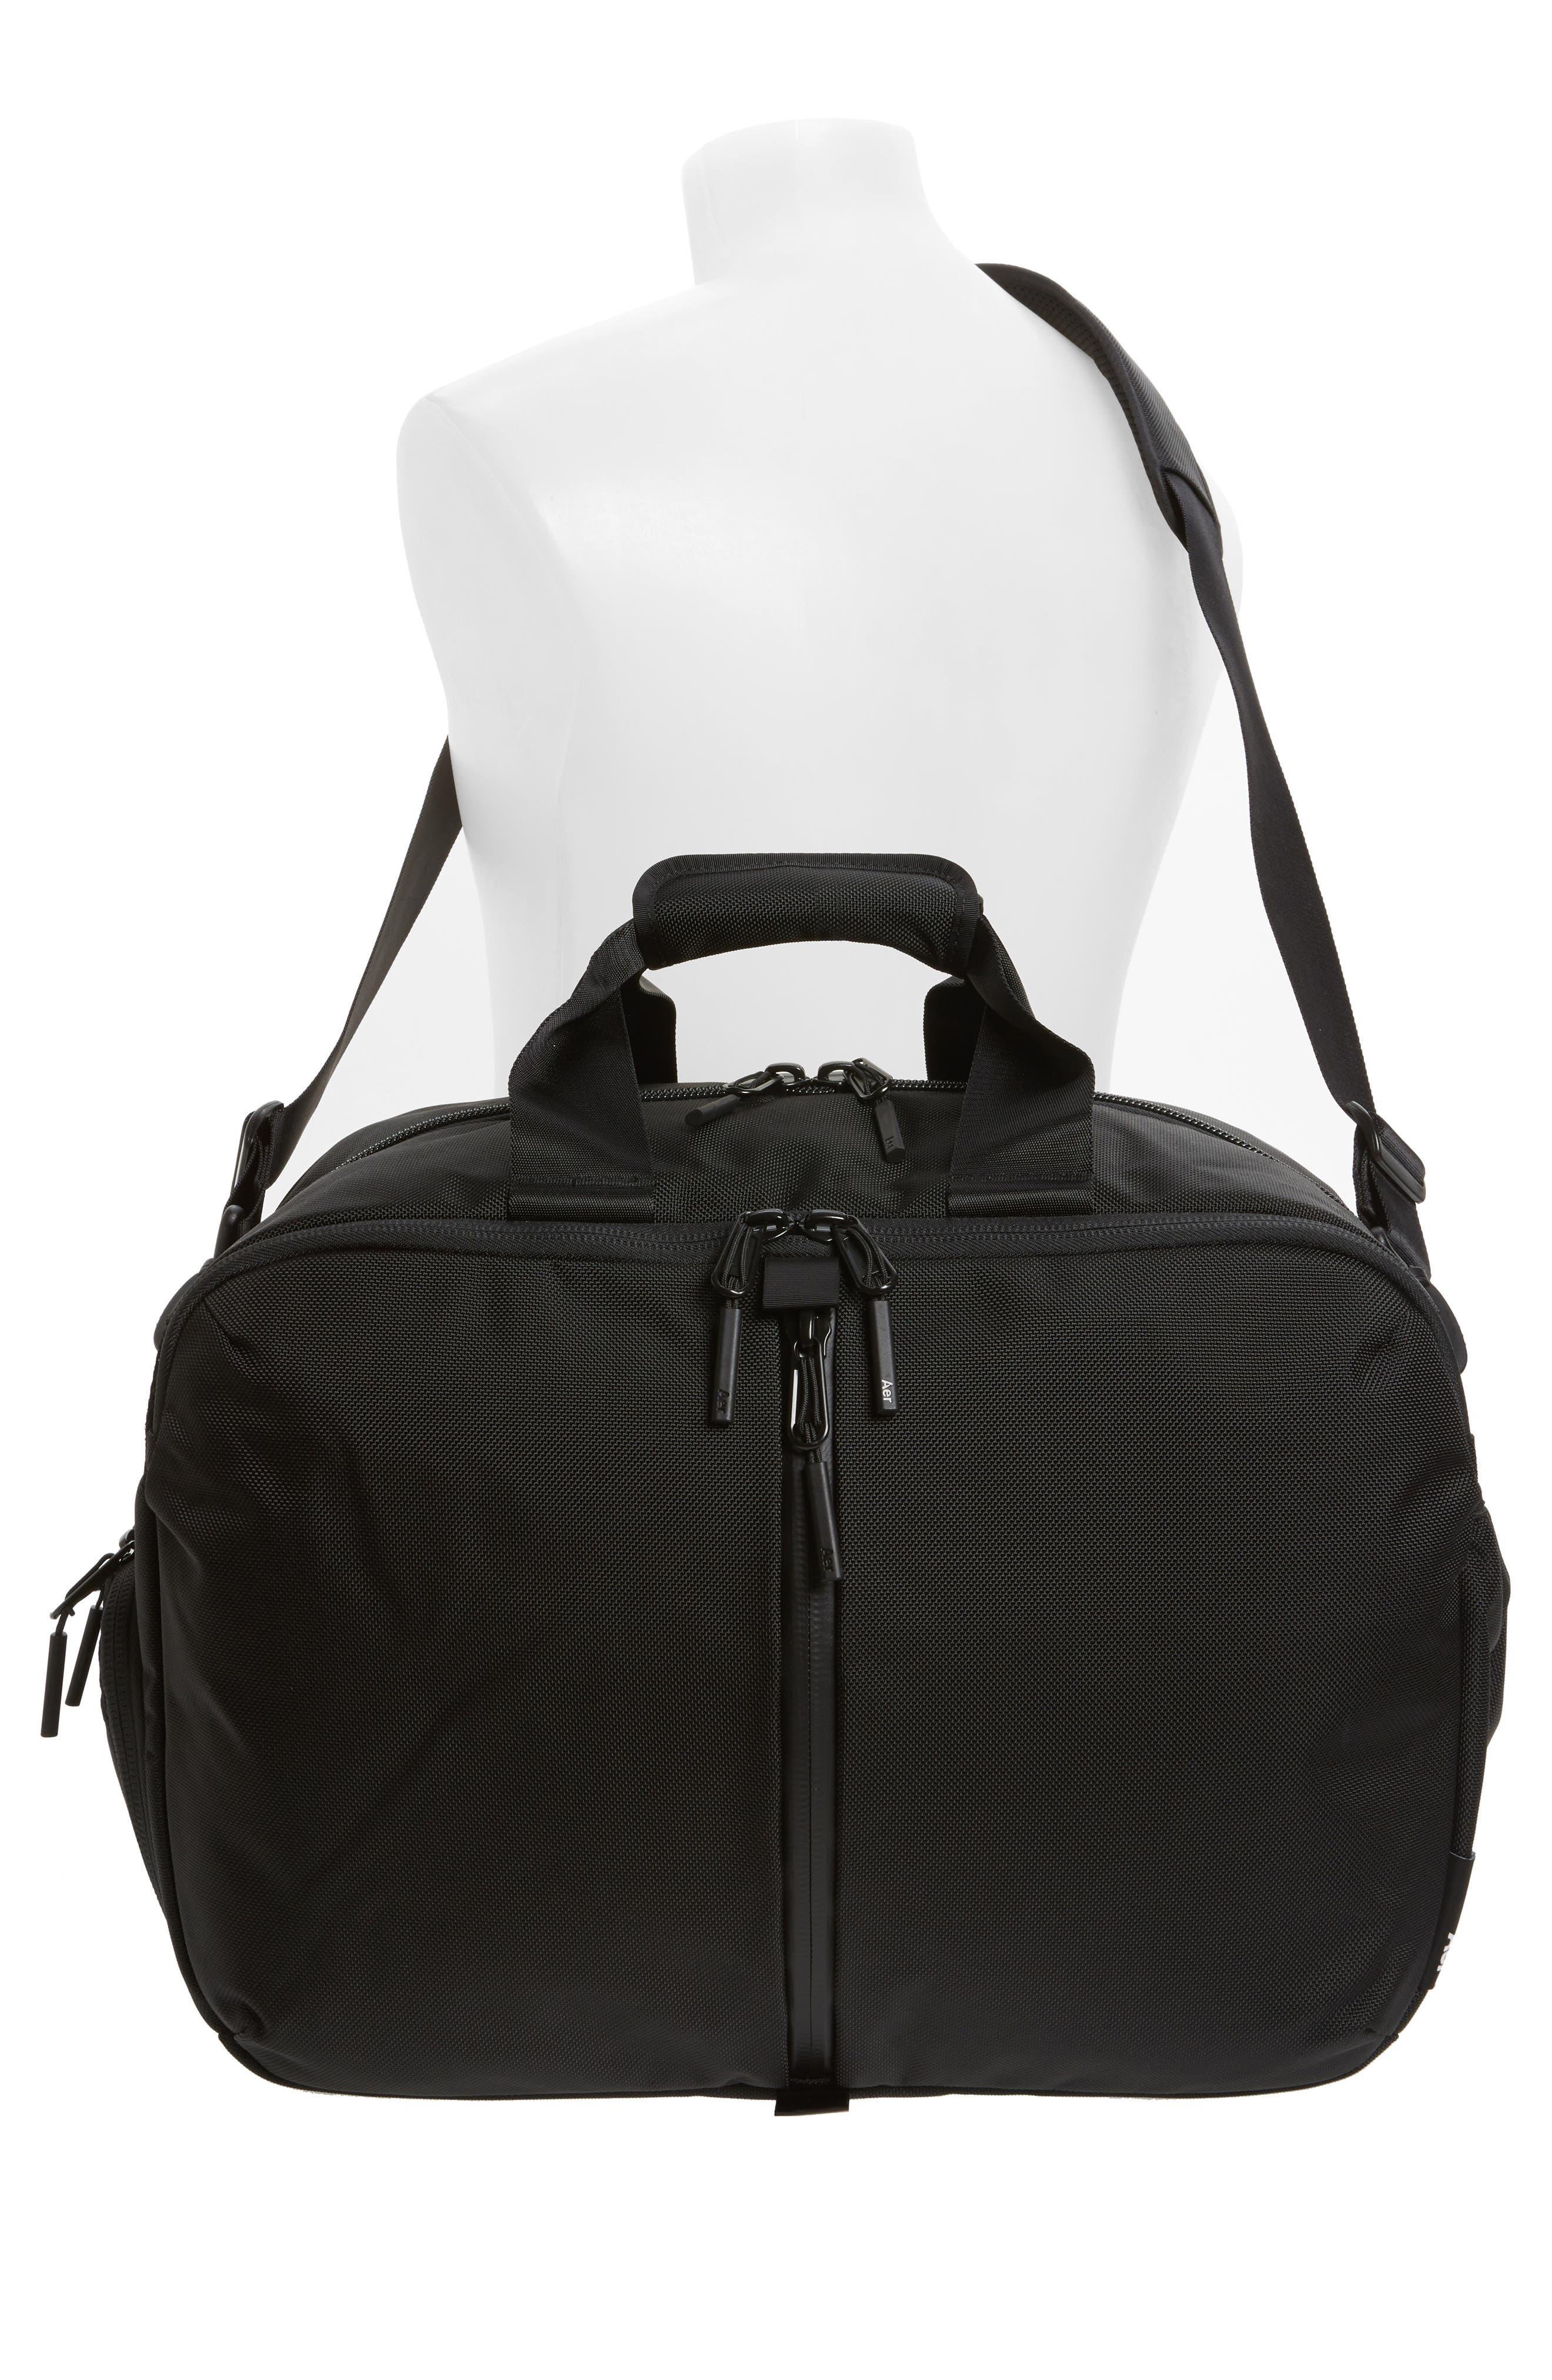 Gym Duffel 2 Bag,                             Alternate thumbnail 2, color,                             Black